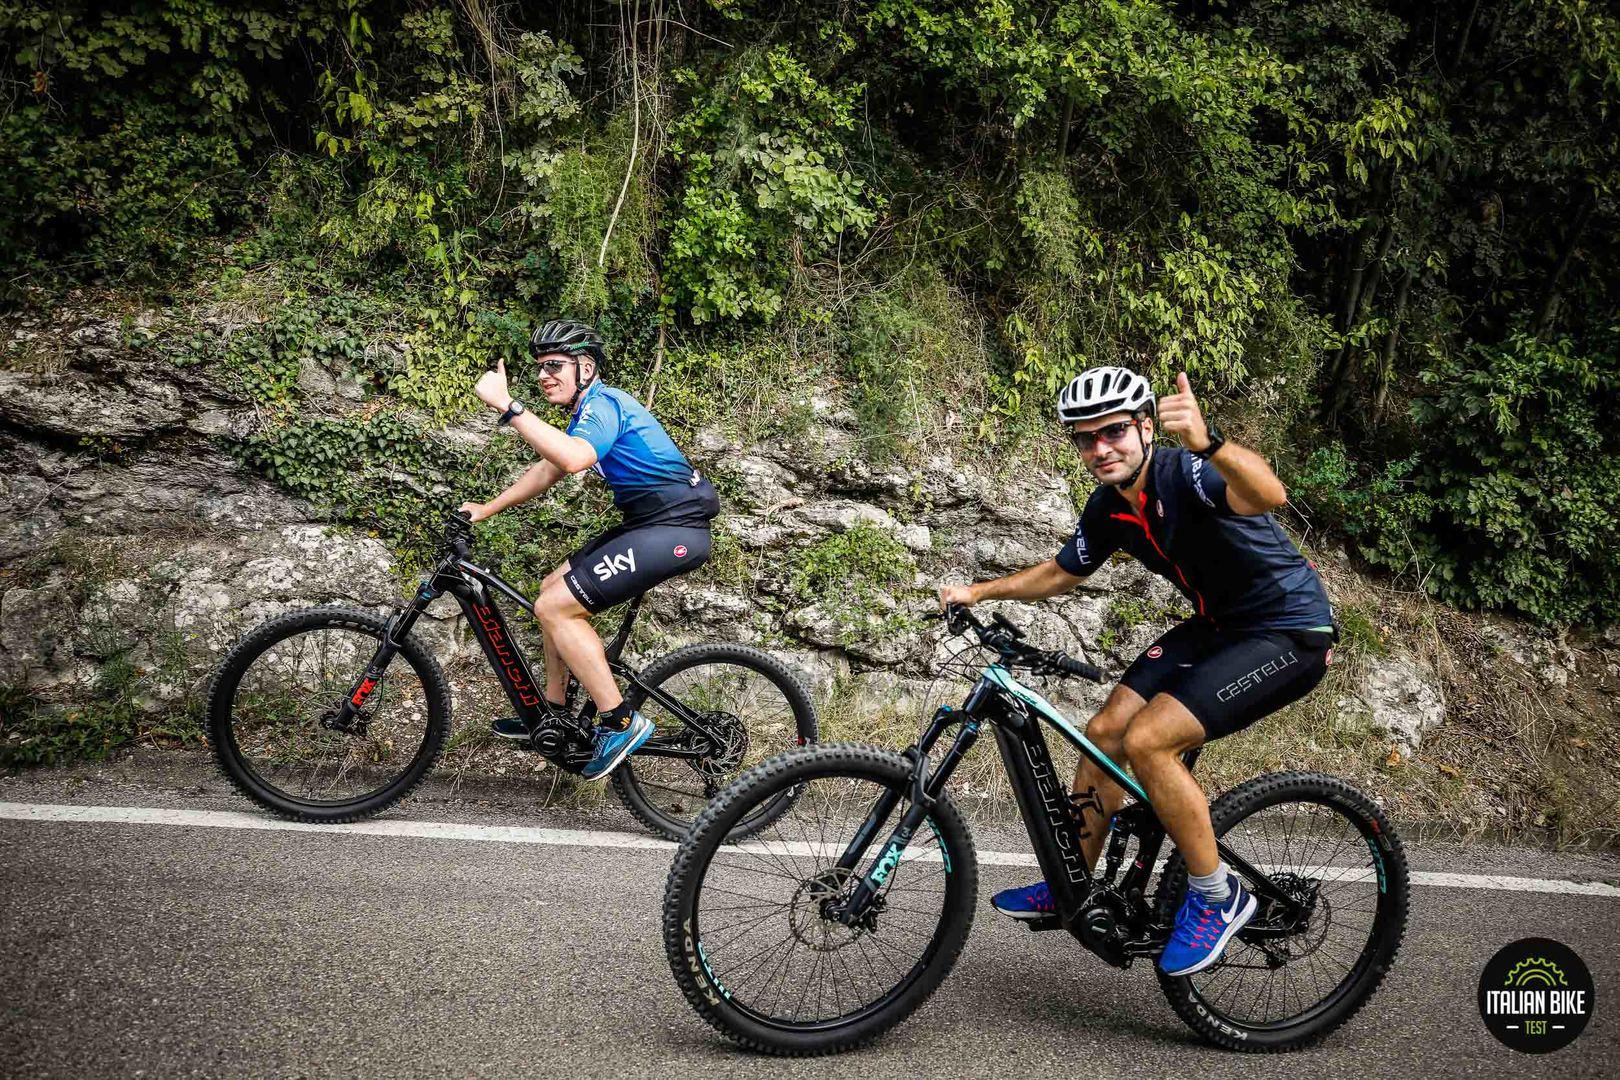 Shimano Steps Italian Bike Test - Alzano Lombardo